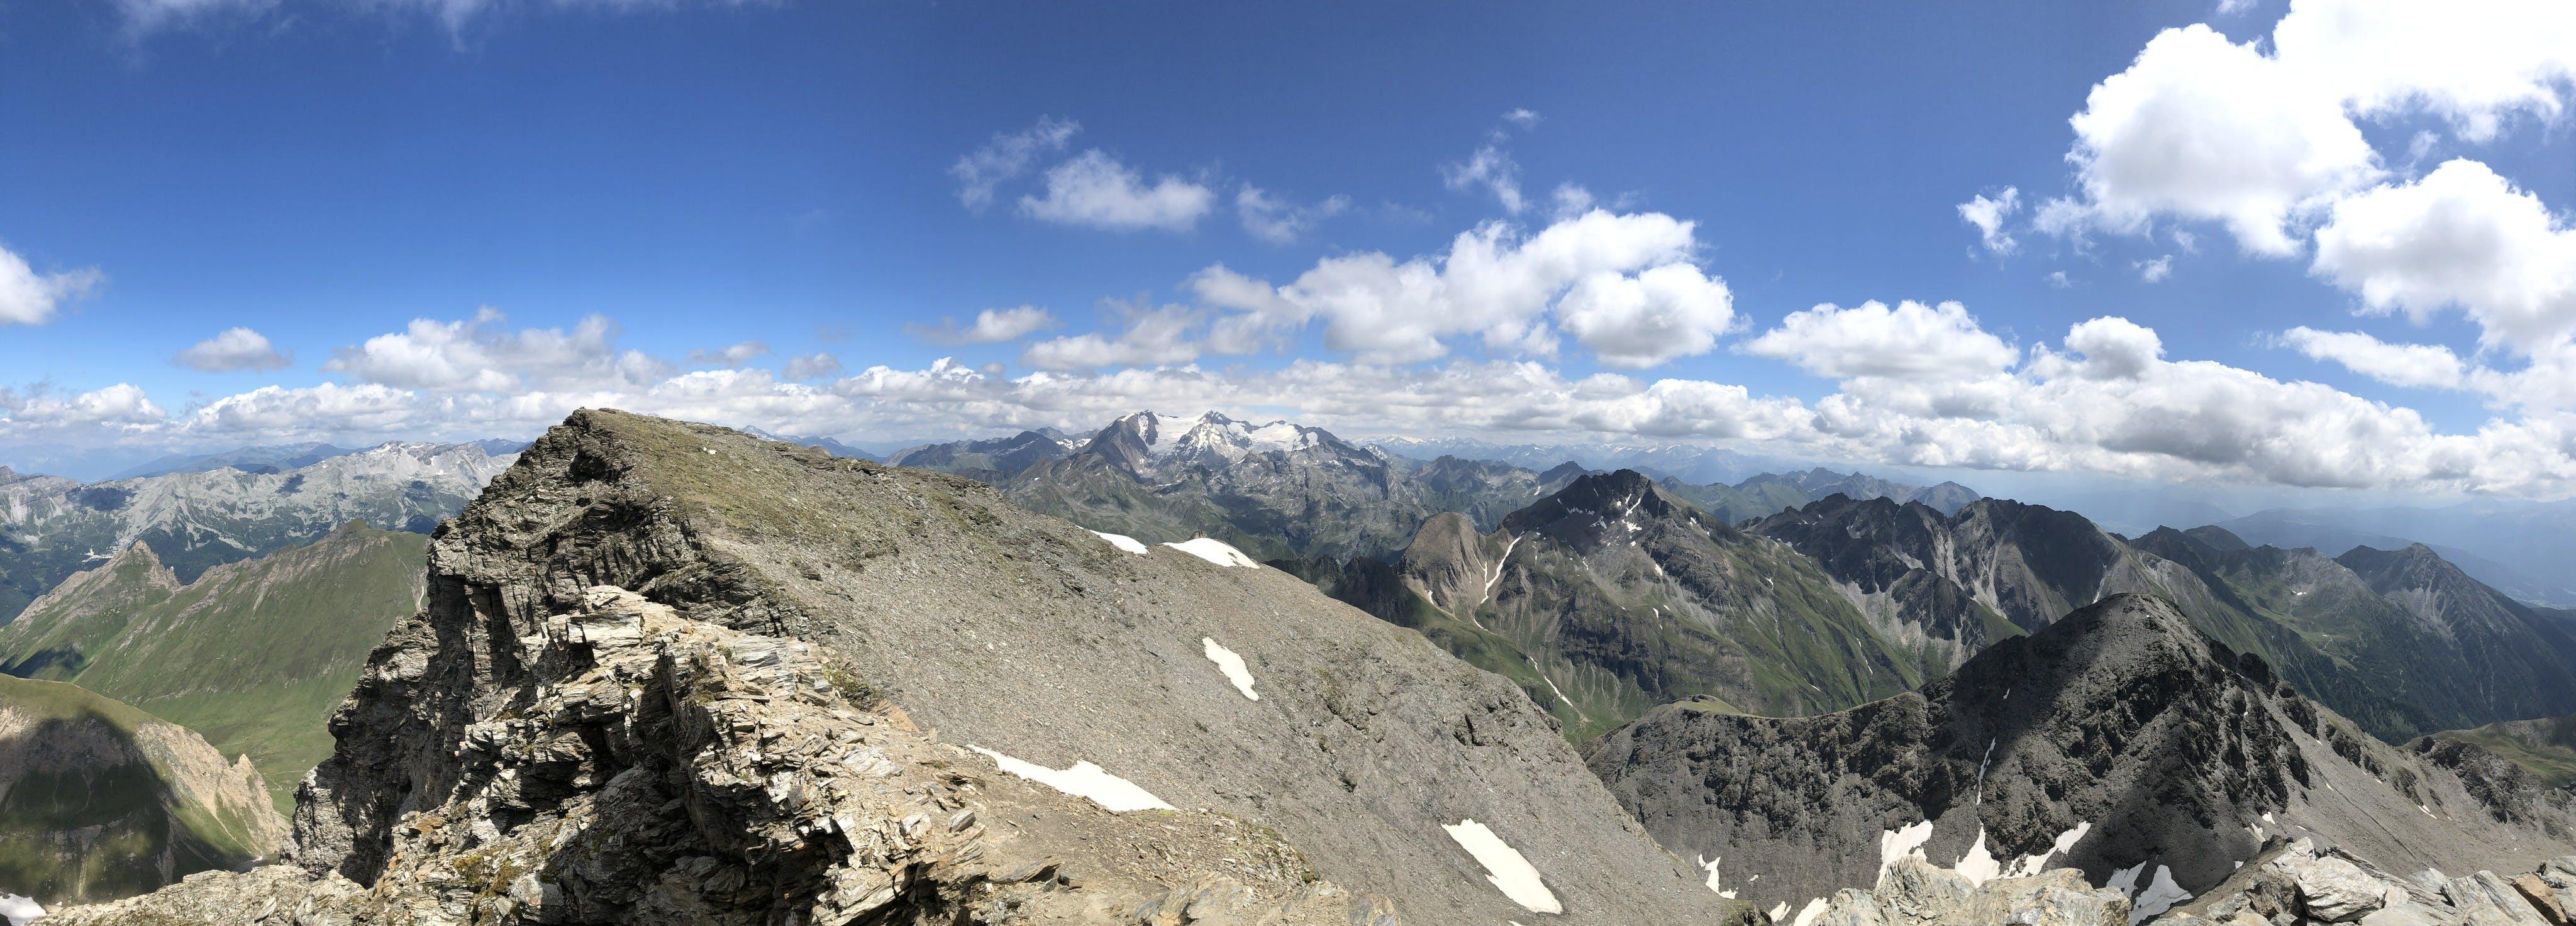 Free stock photo of mountain, panorama